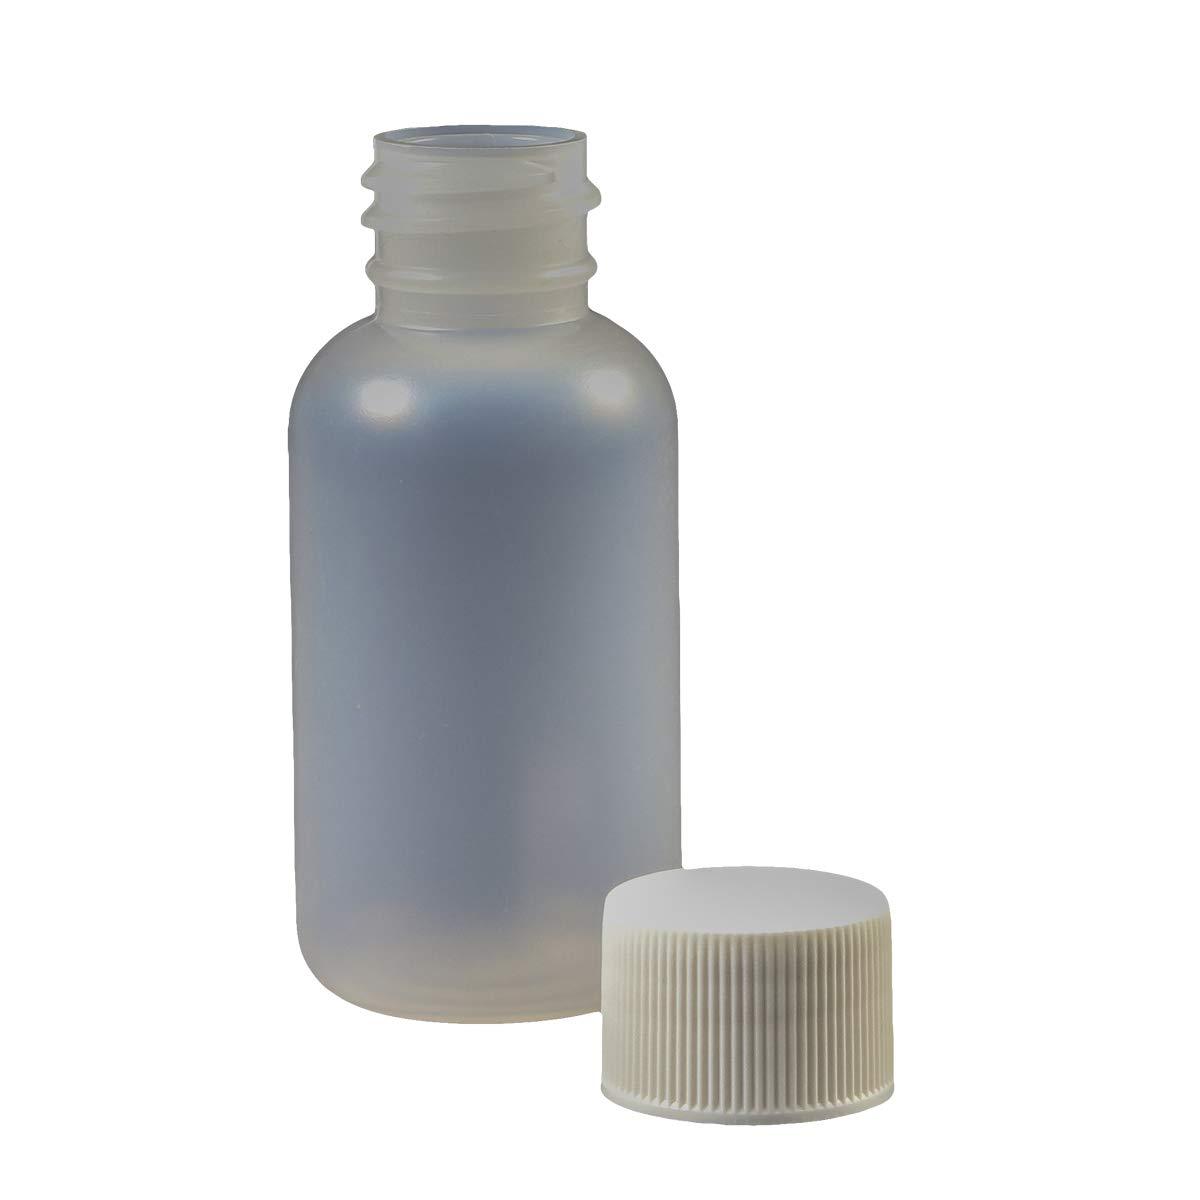 Jensen Global JG1.0BC-CC 1.0 oz Boston Round Bottle and Closed Cap Bag of 10